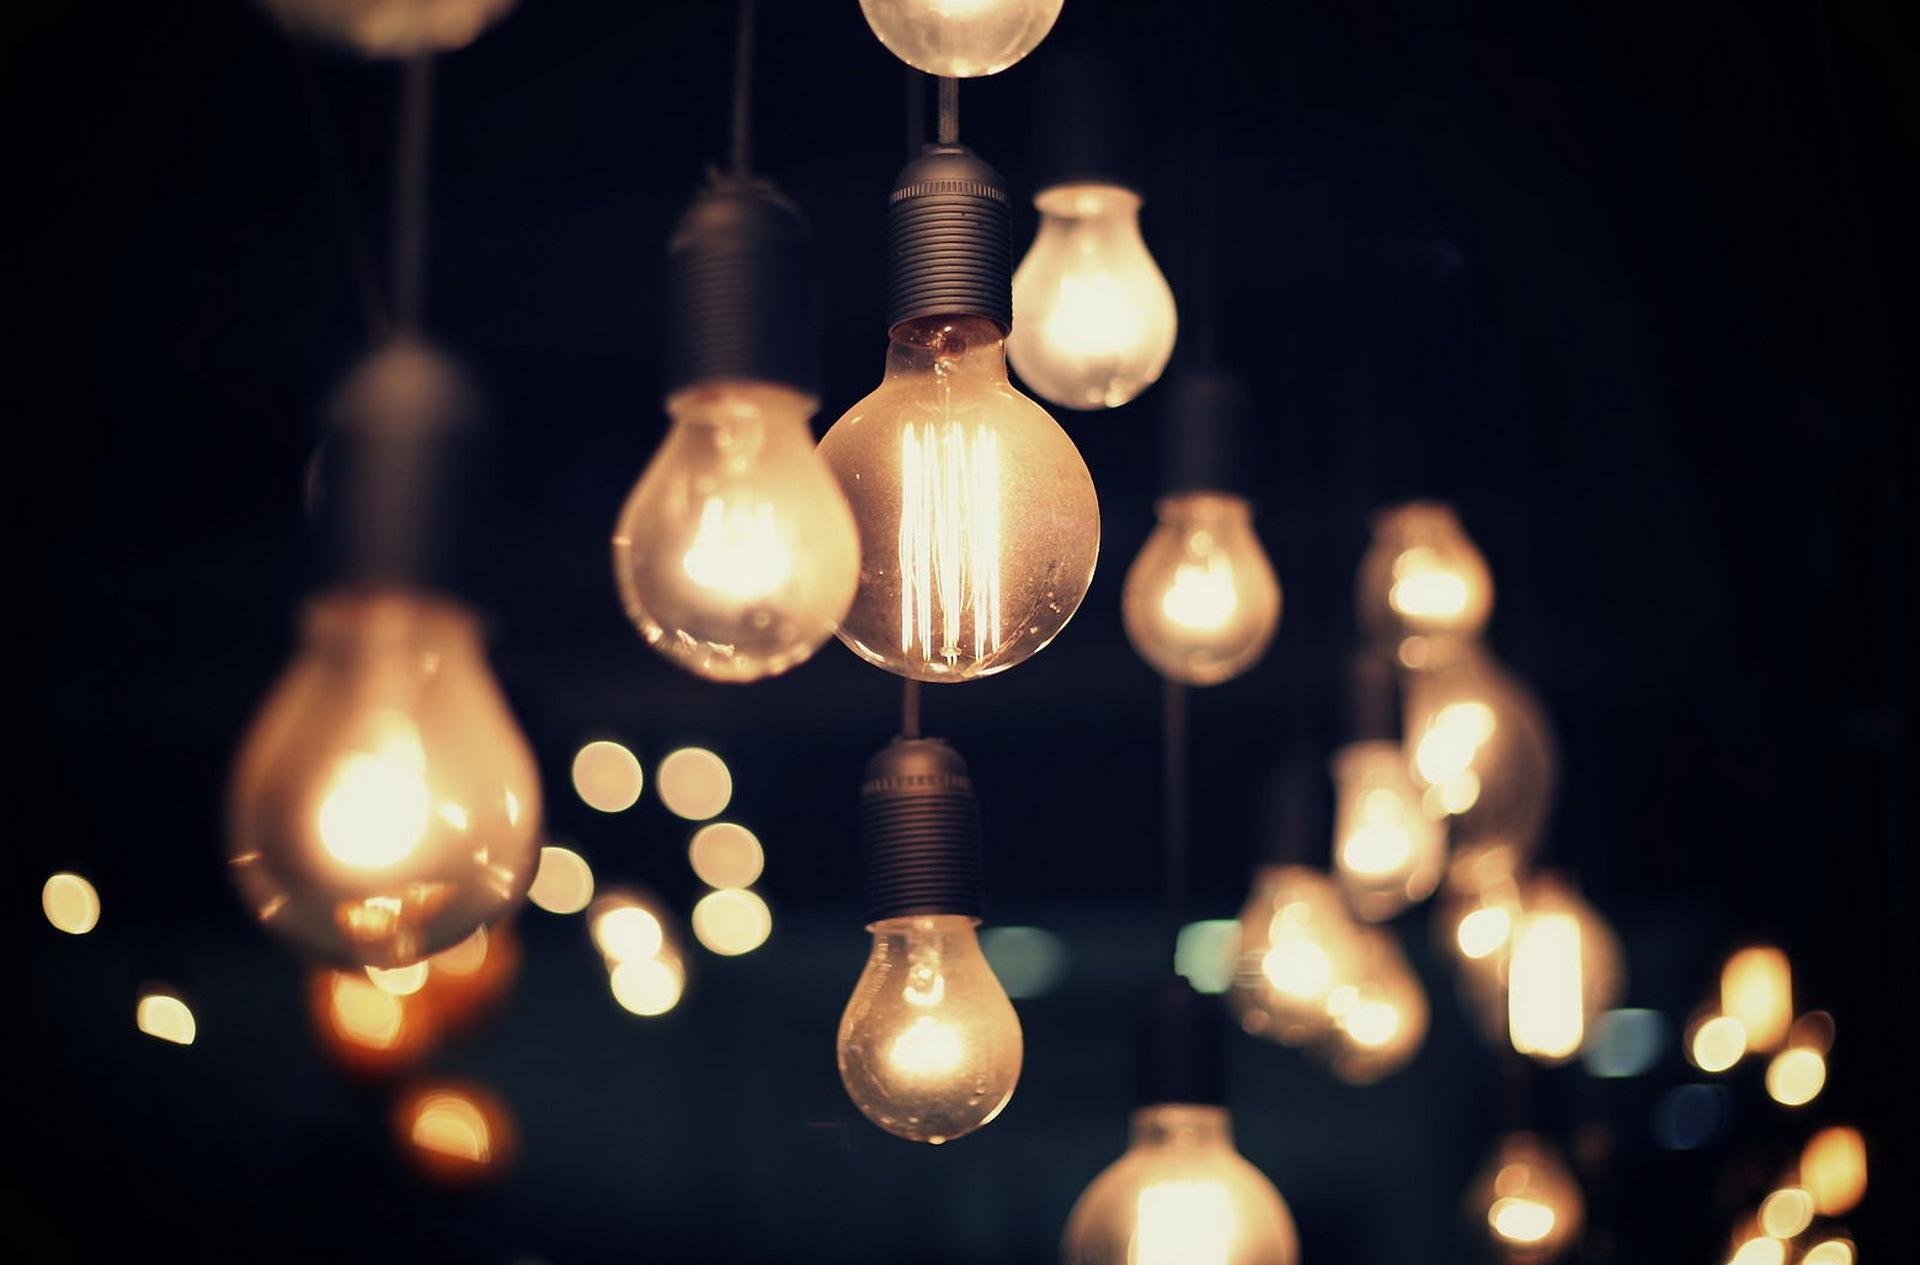 Light bulb hd wallpaper background image 1920x1265 id 855715 wallpaper abyss - Light night wallpaper ...